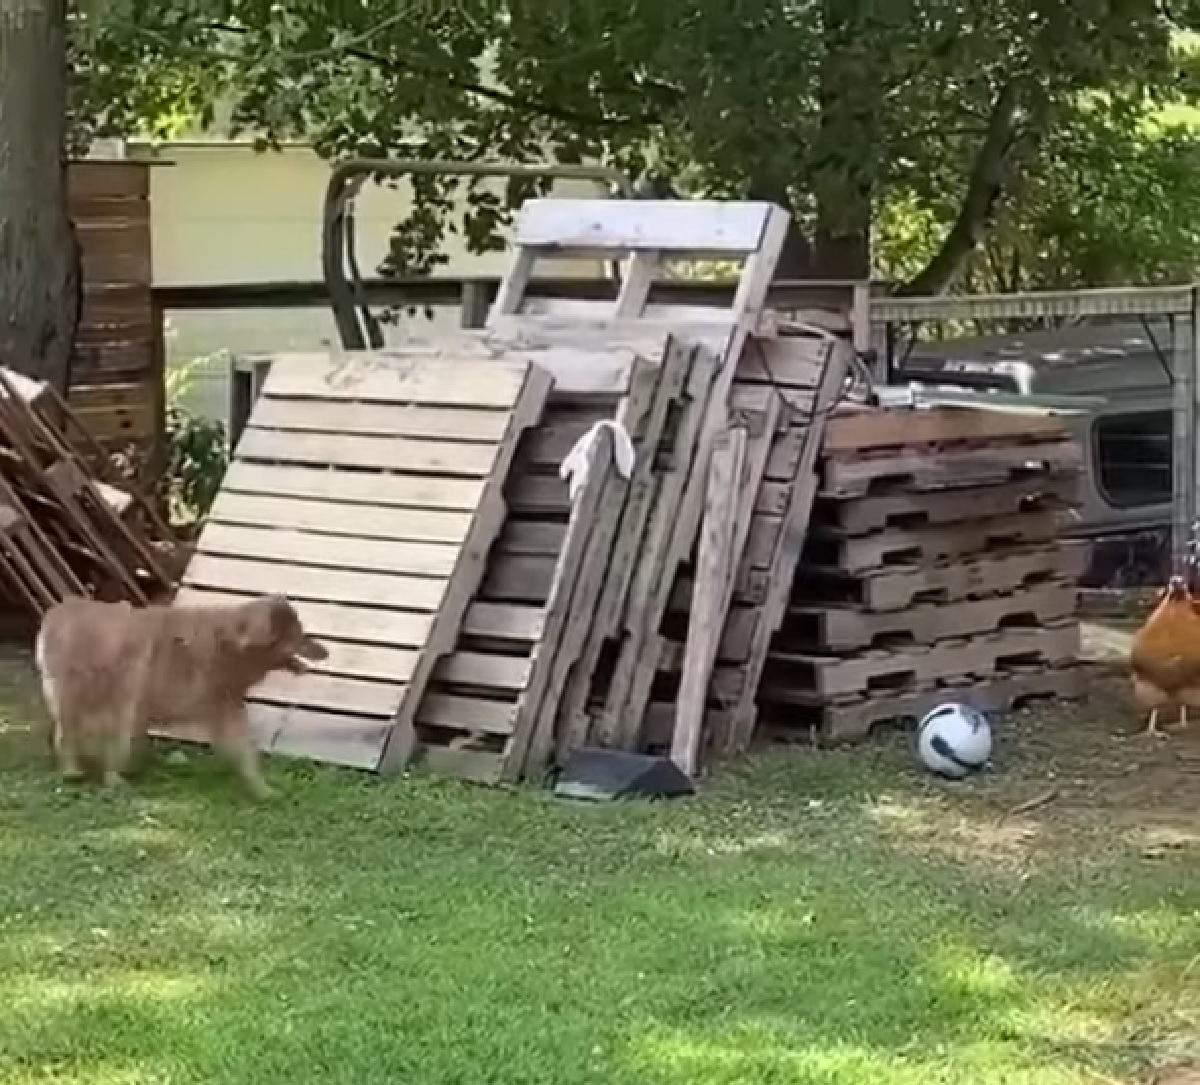 clay cucciola inseguimento veloce